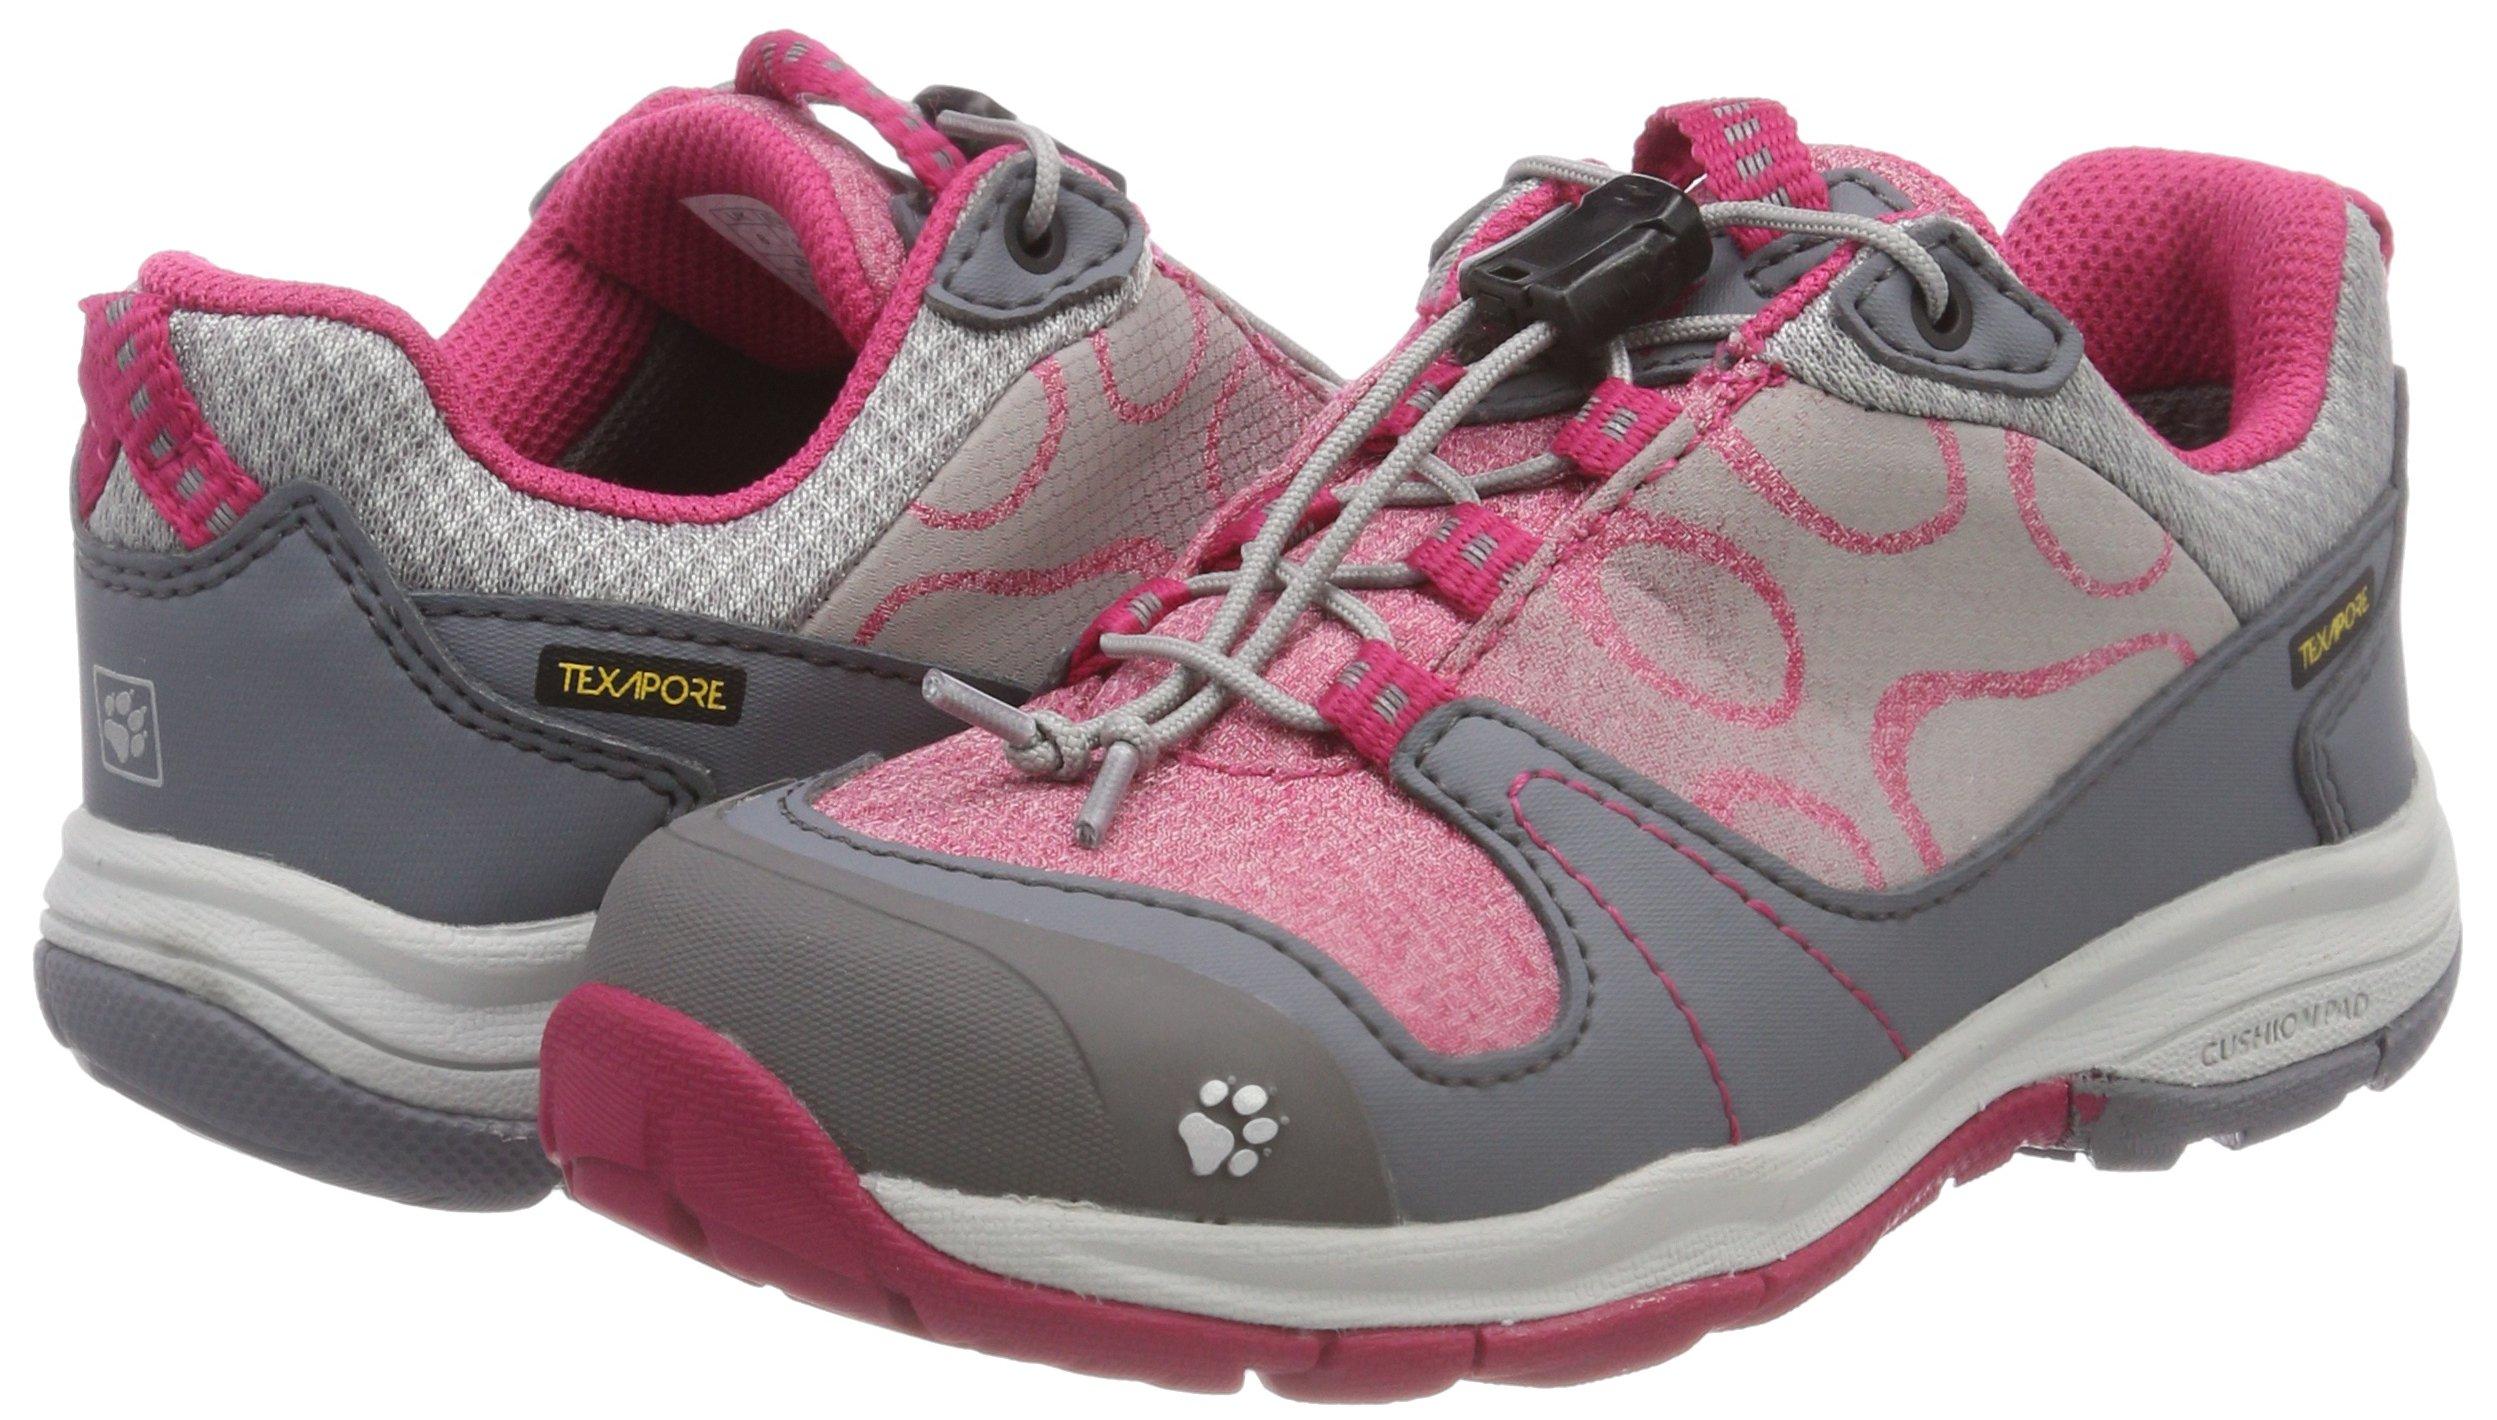 Jack Wolfskin Girls Grivla Texapore Low G Wasserdicht Rise Hiking Shoes 5